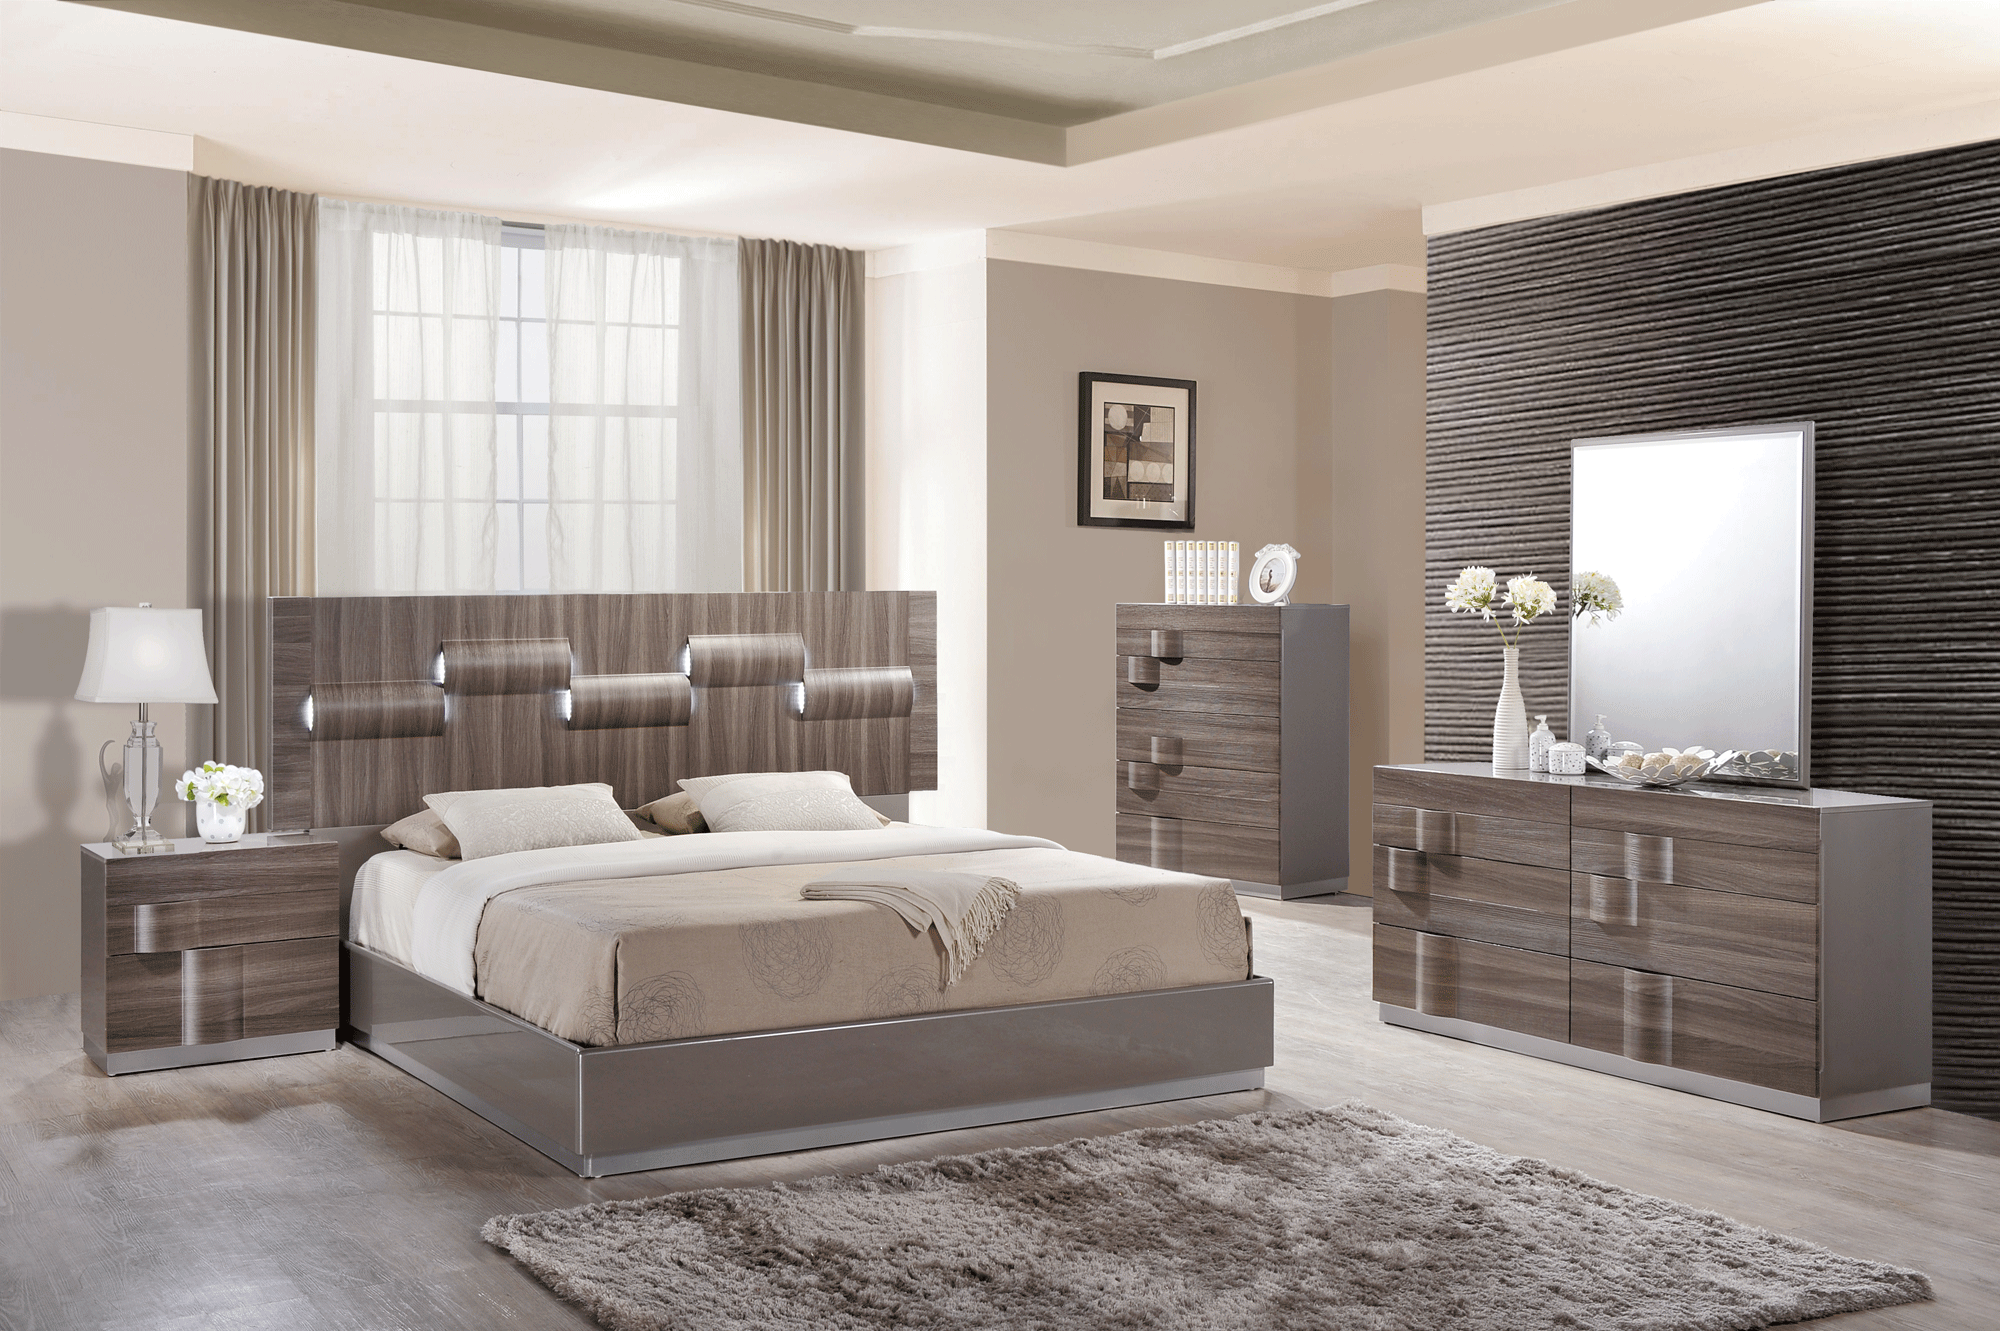 Adel Grey Glossy Zebra Wood Bedroom Set By Global Furniture